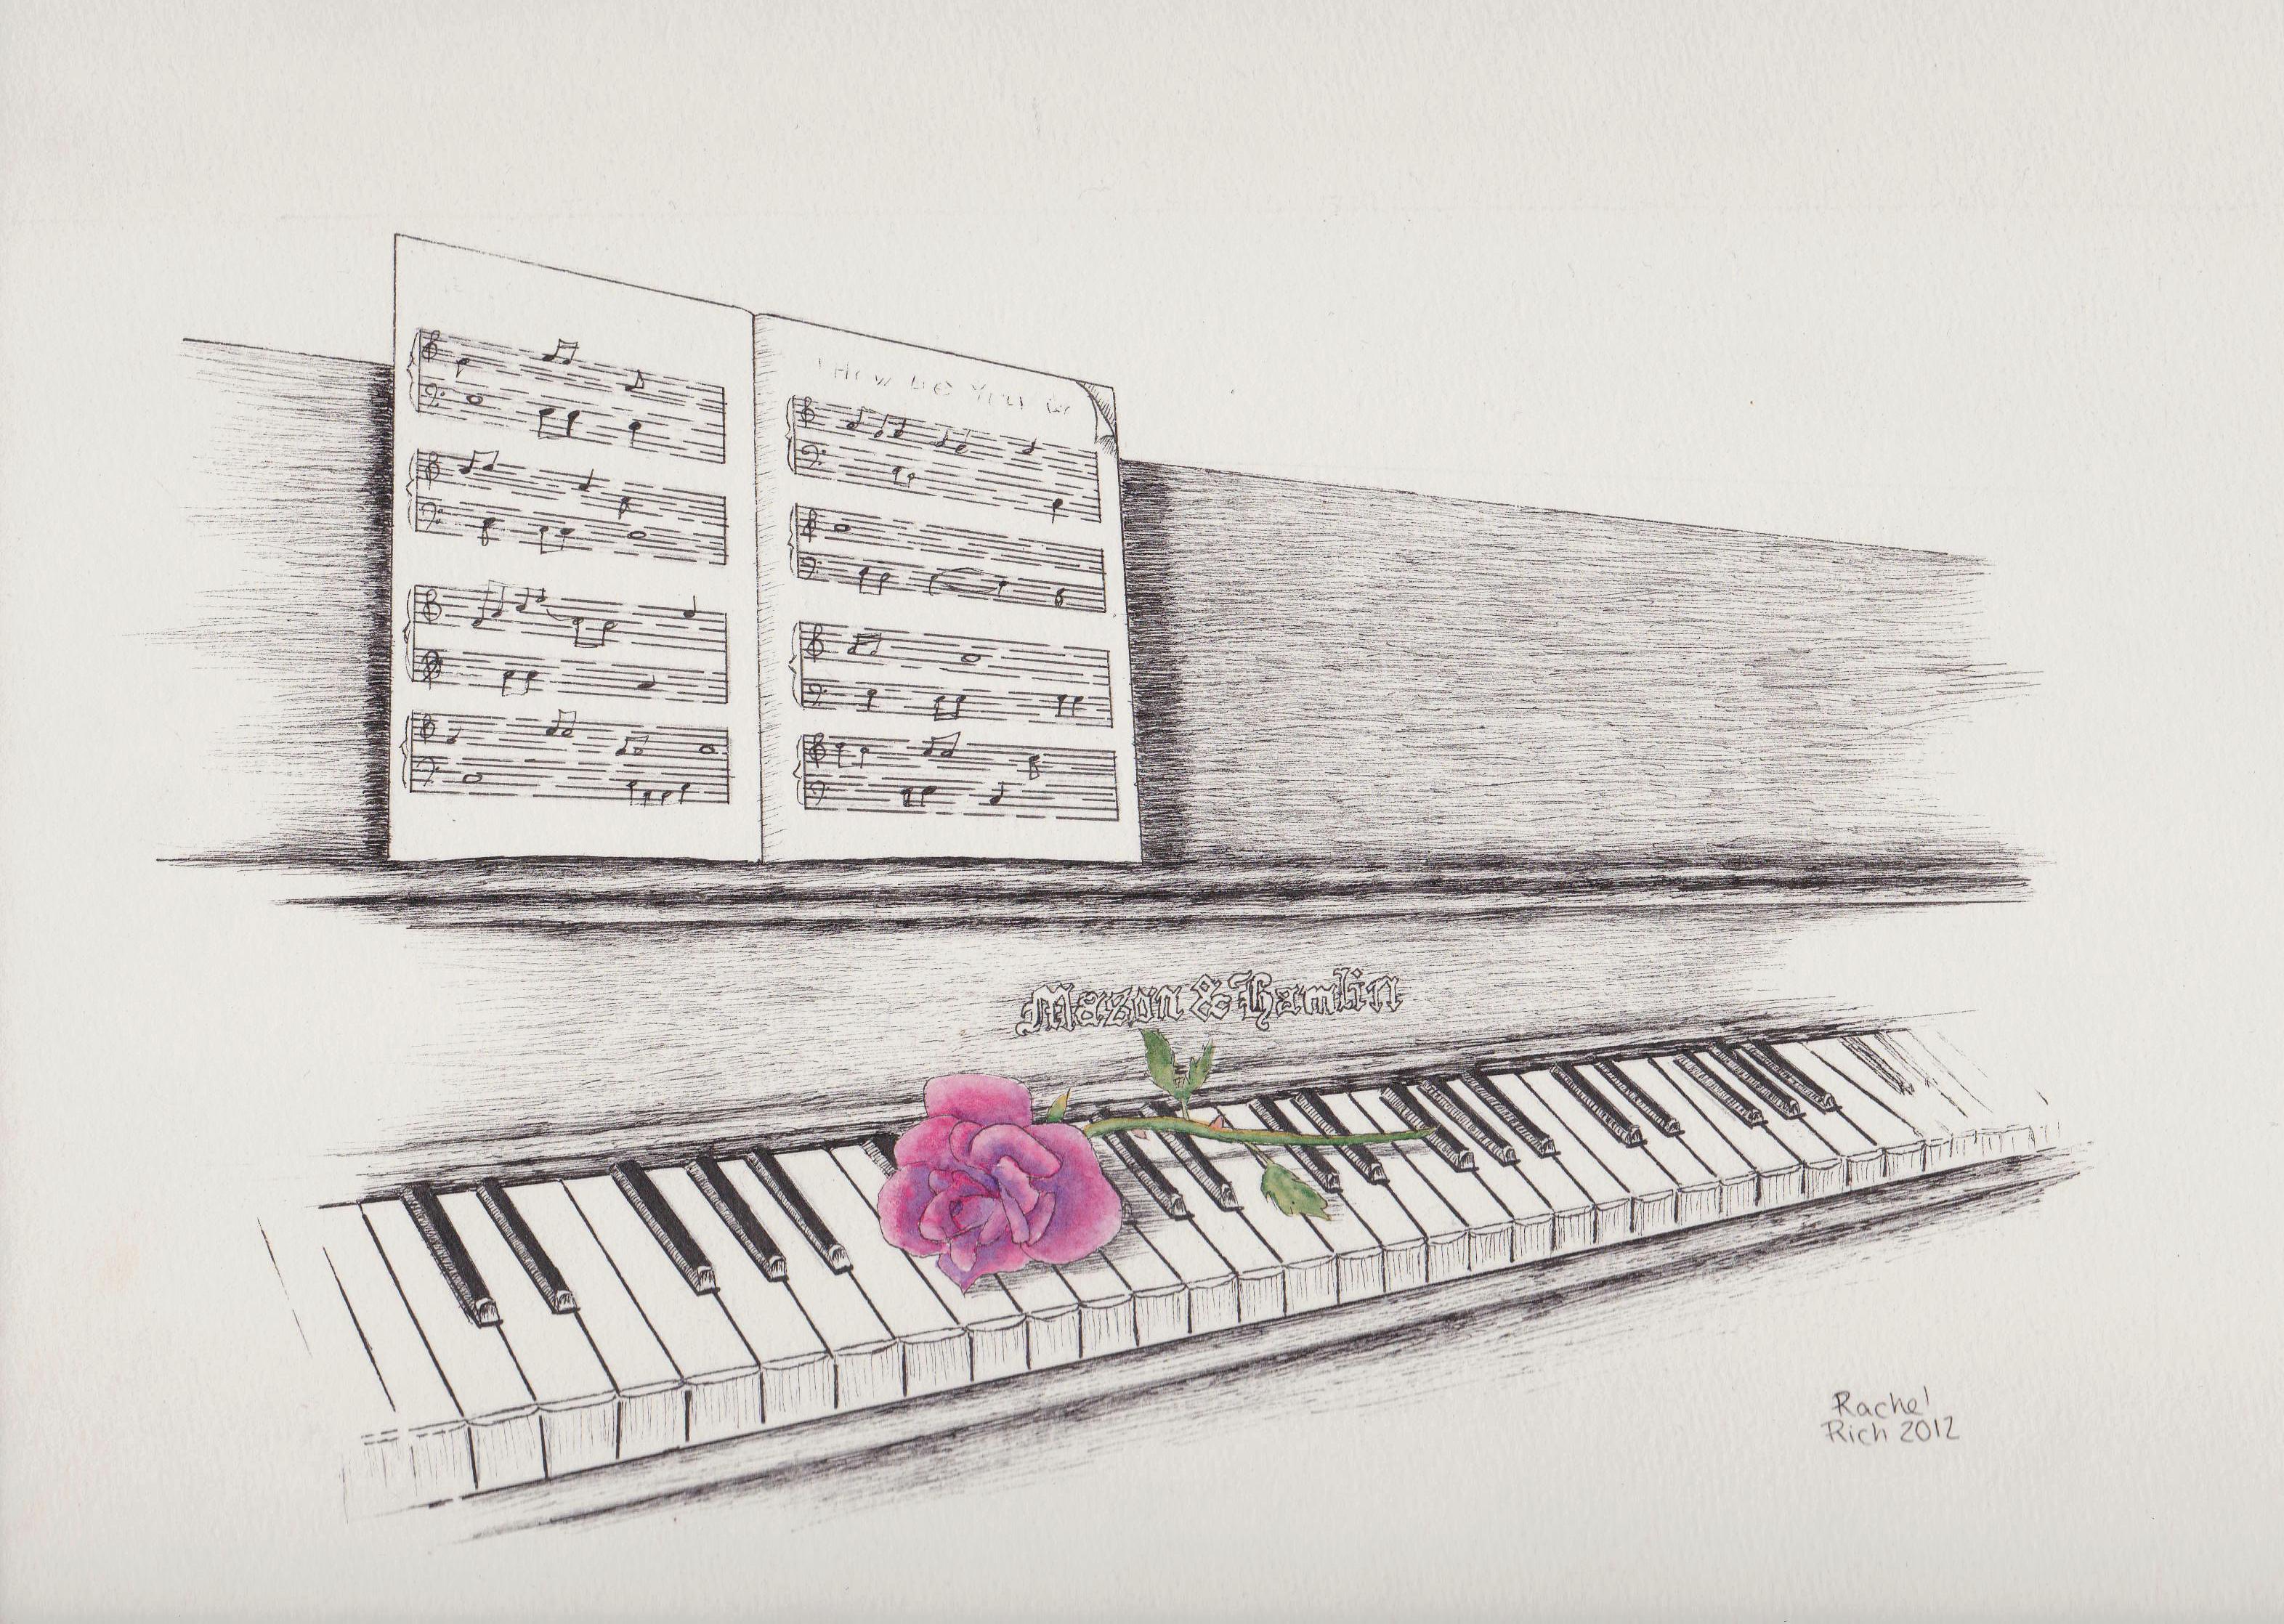 Piano and Rose by RCR123